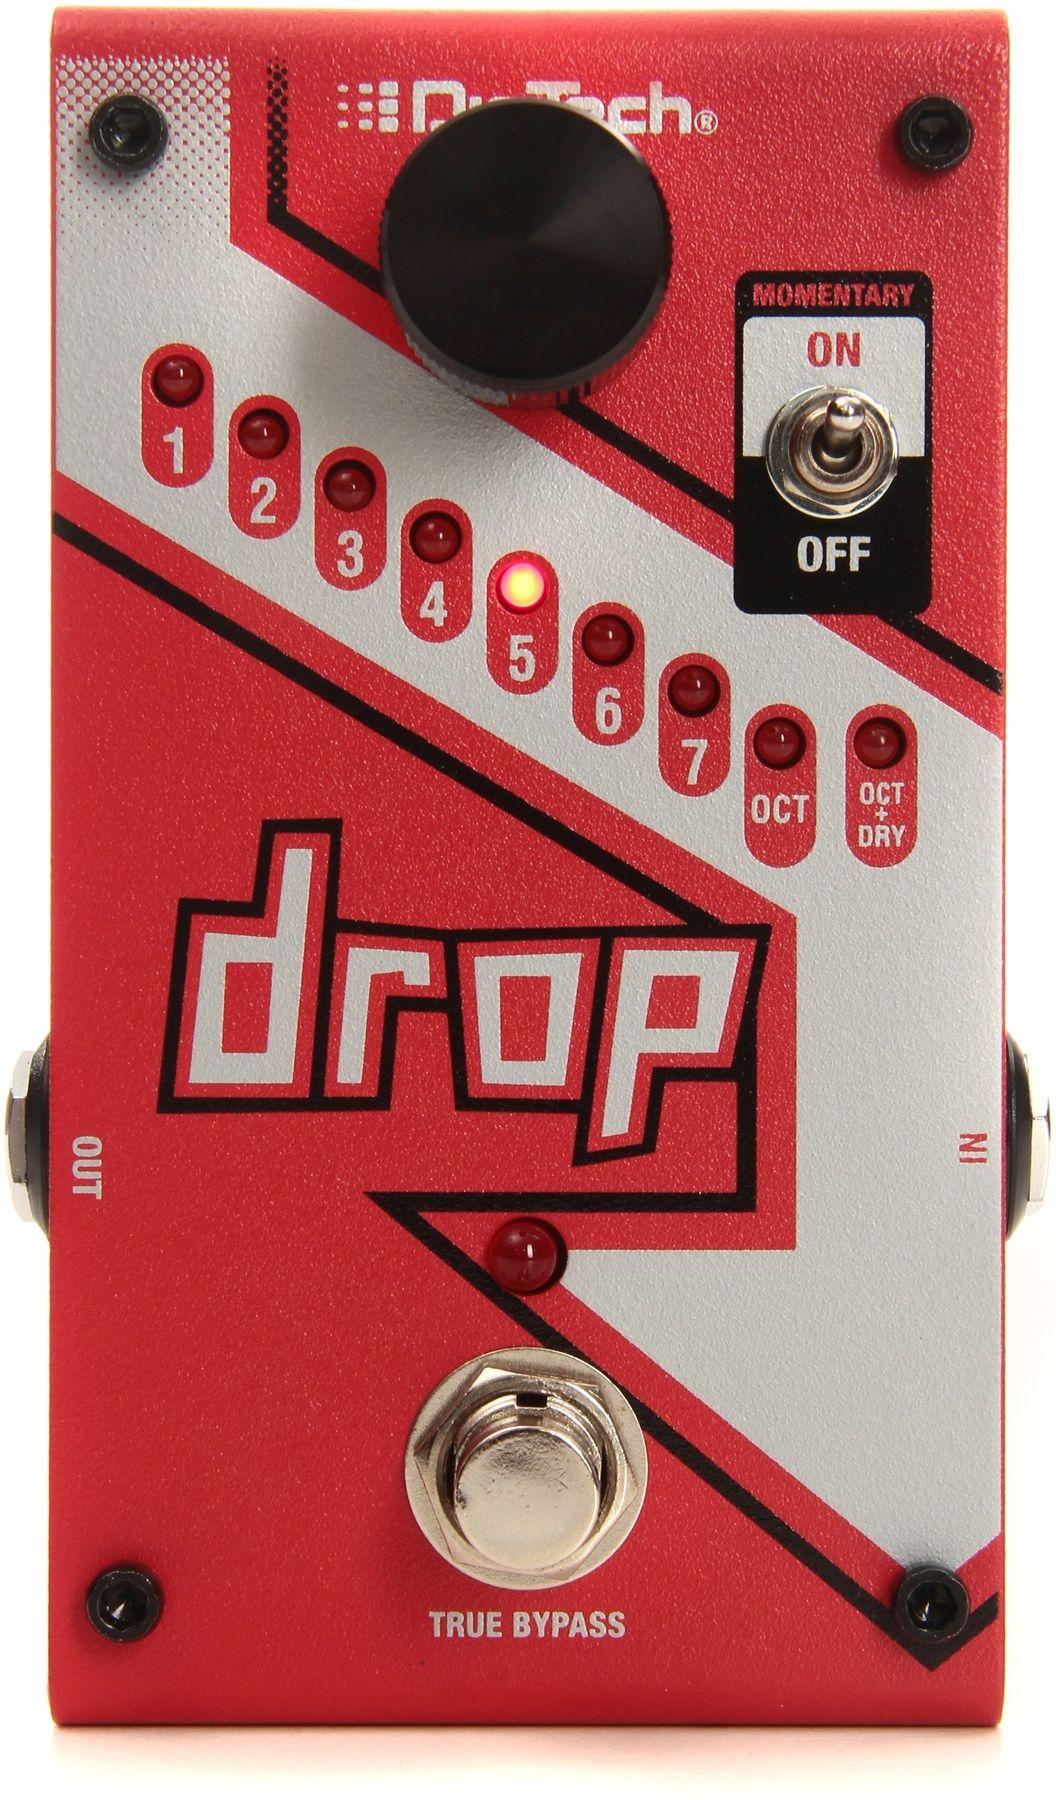 Digitech drop polyphonic drop tune pitchshift pedal